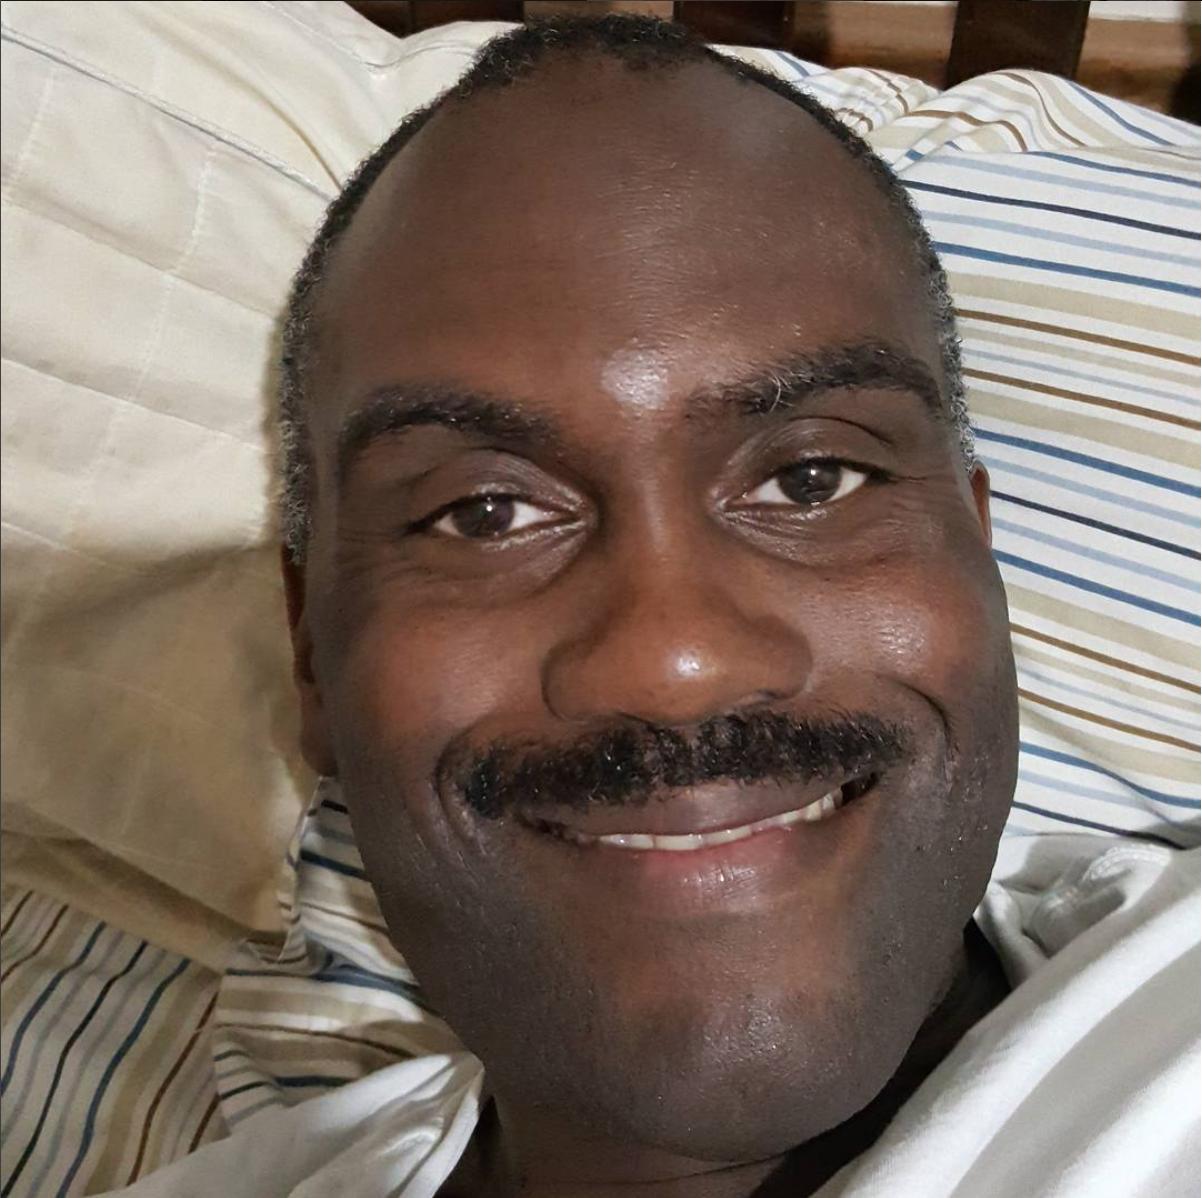 MrPimpGoodGame, le roi des selfies